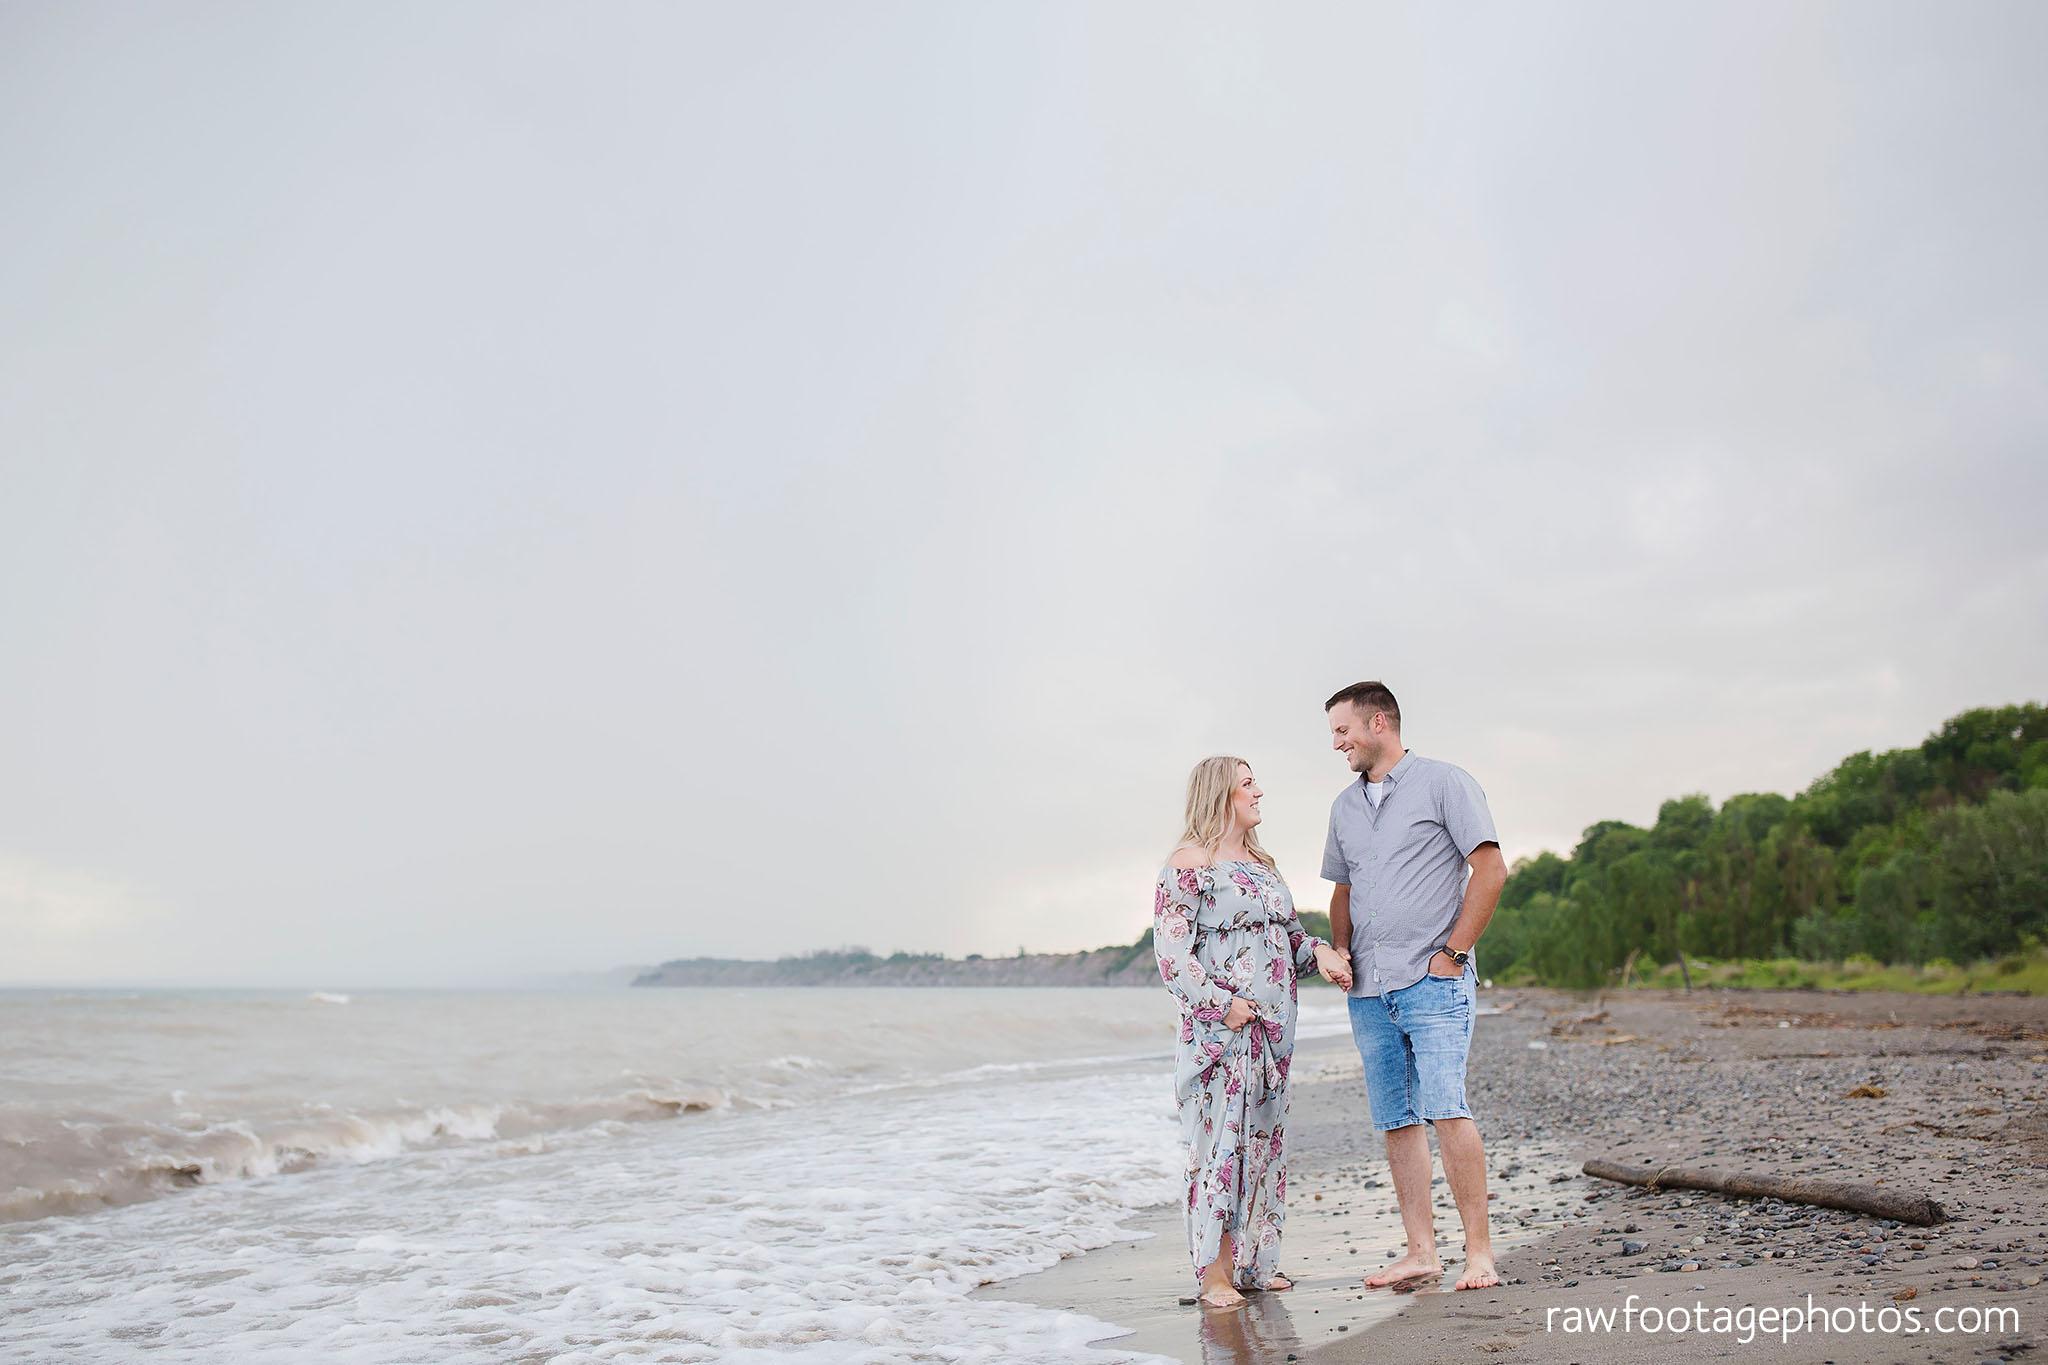 london_ontario_photographer-raw_footage_photography-beach_minis-port_stanley_beach-family_photographer-couple_photographer-lifestyle_photographer037.jpg